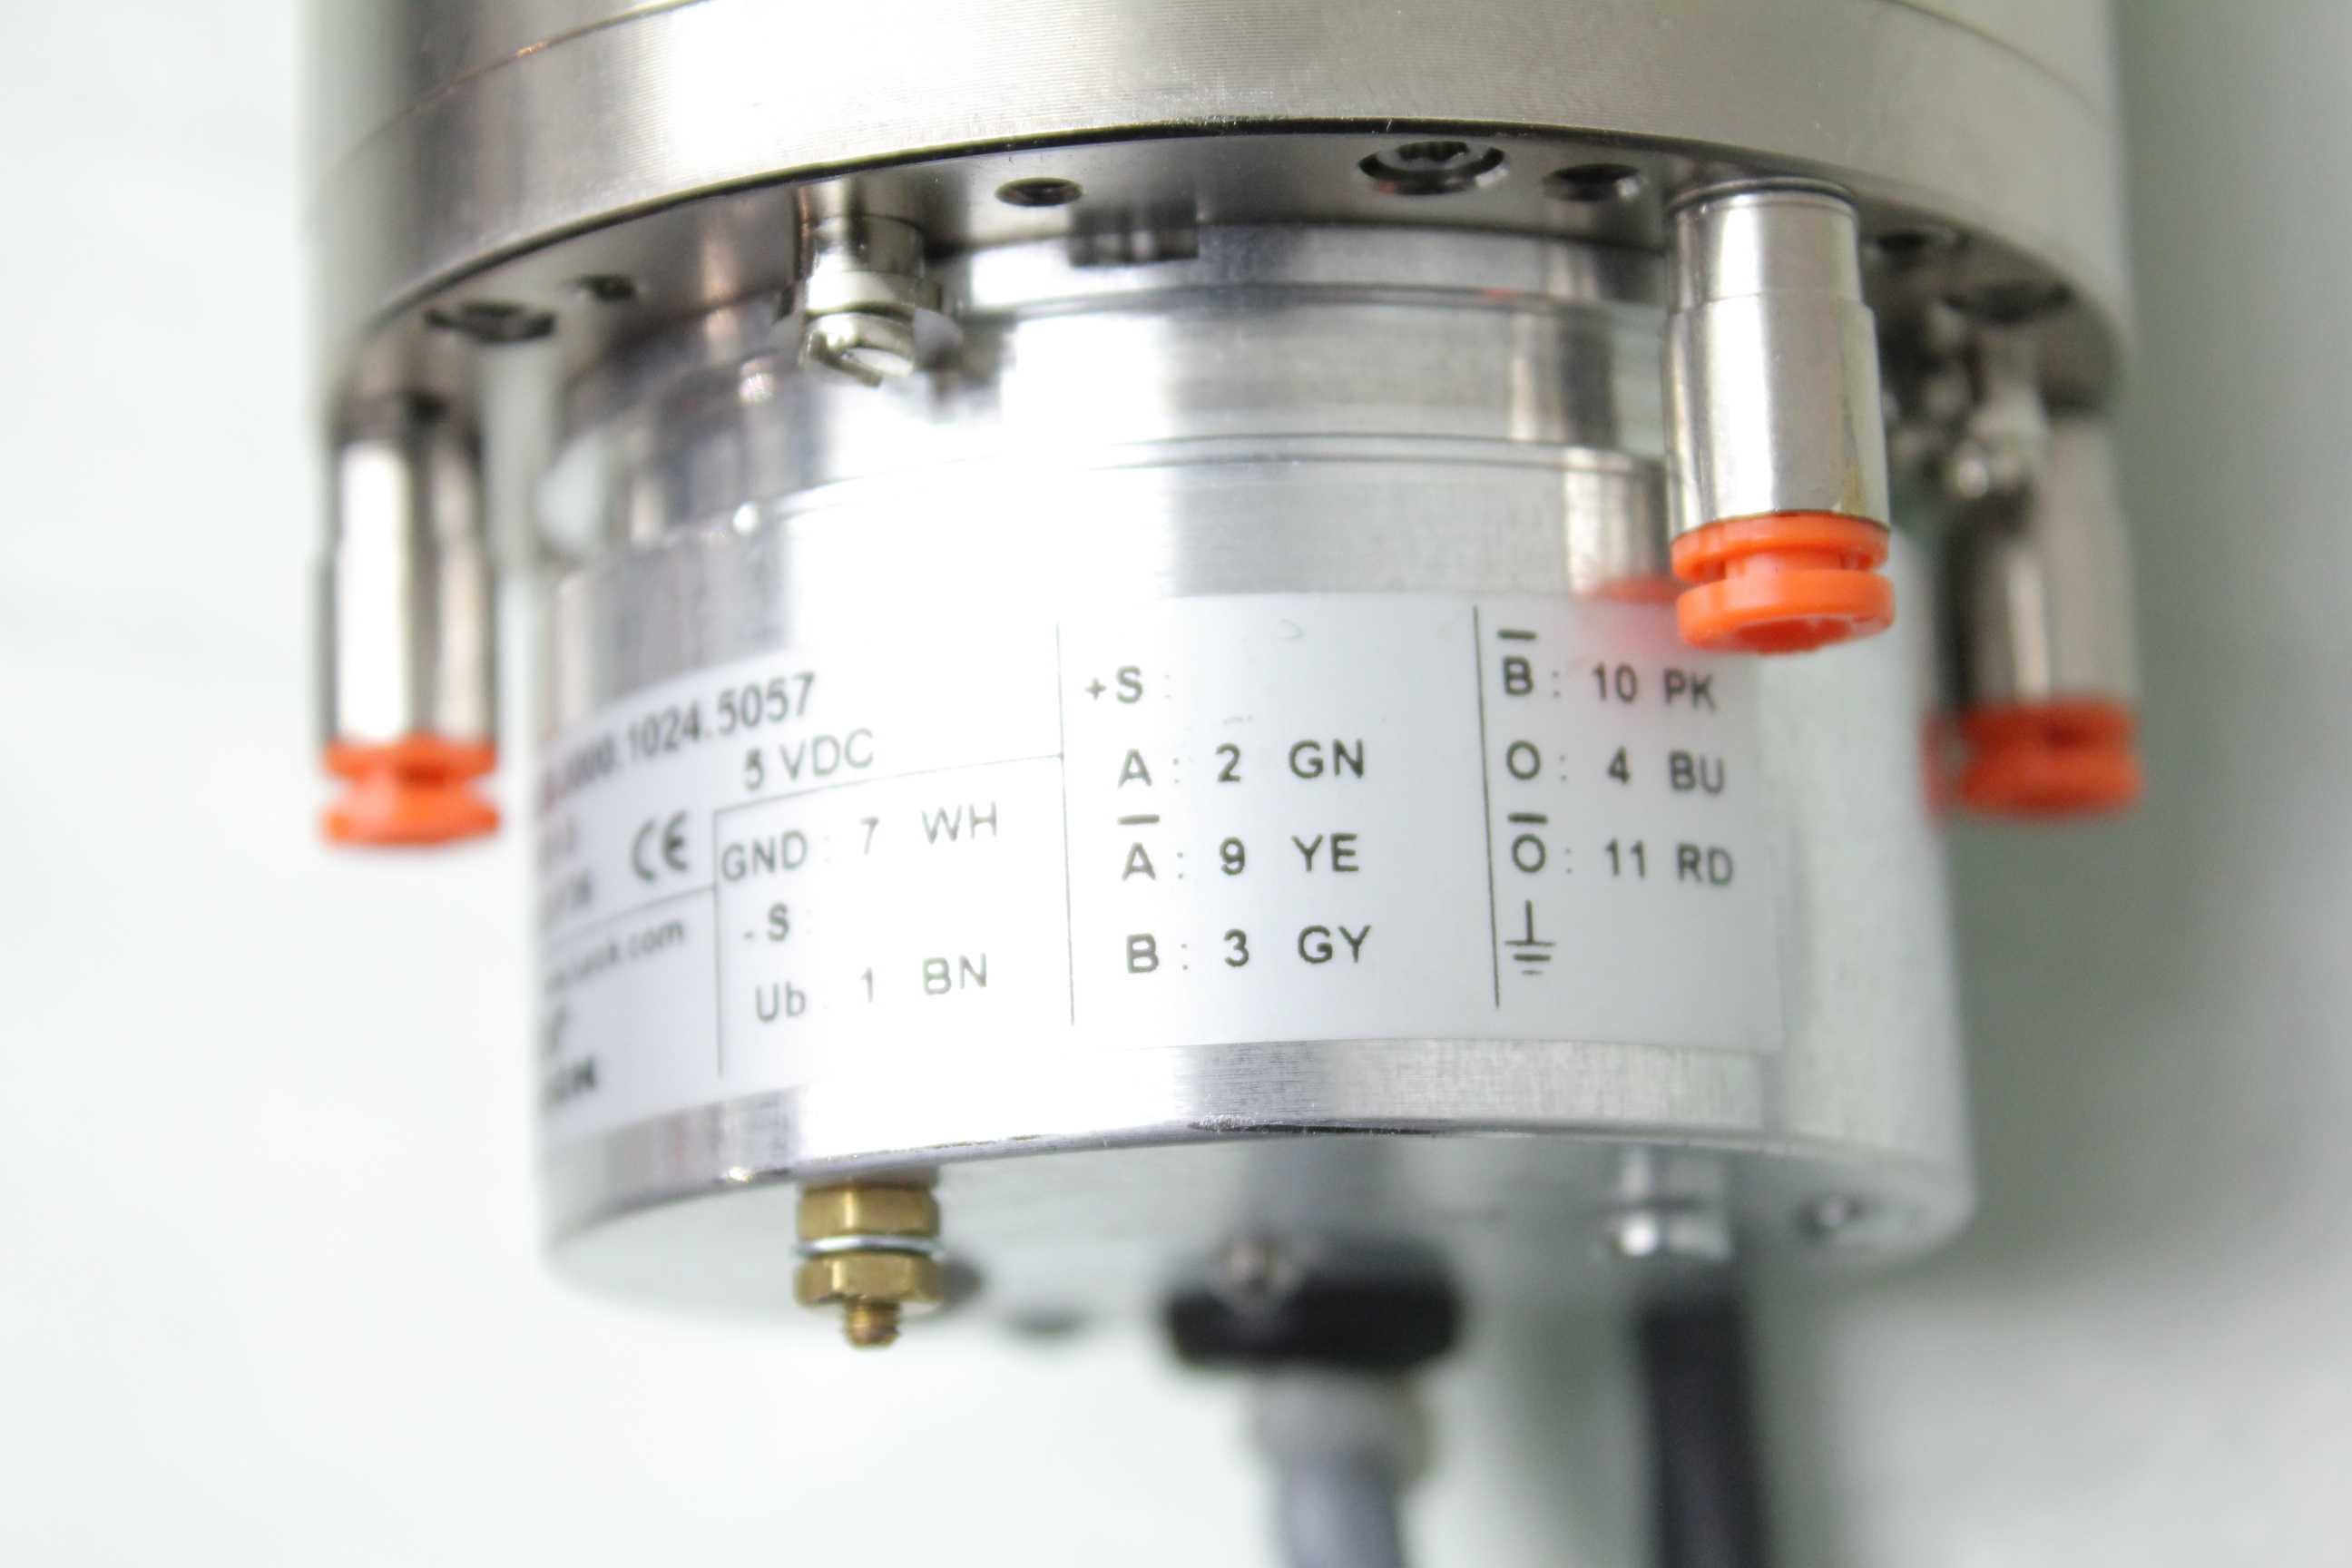 kubler encoder wiring diagram car dover motion revolution xl air bearing high speed spindle